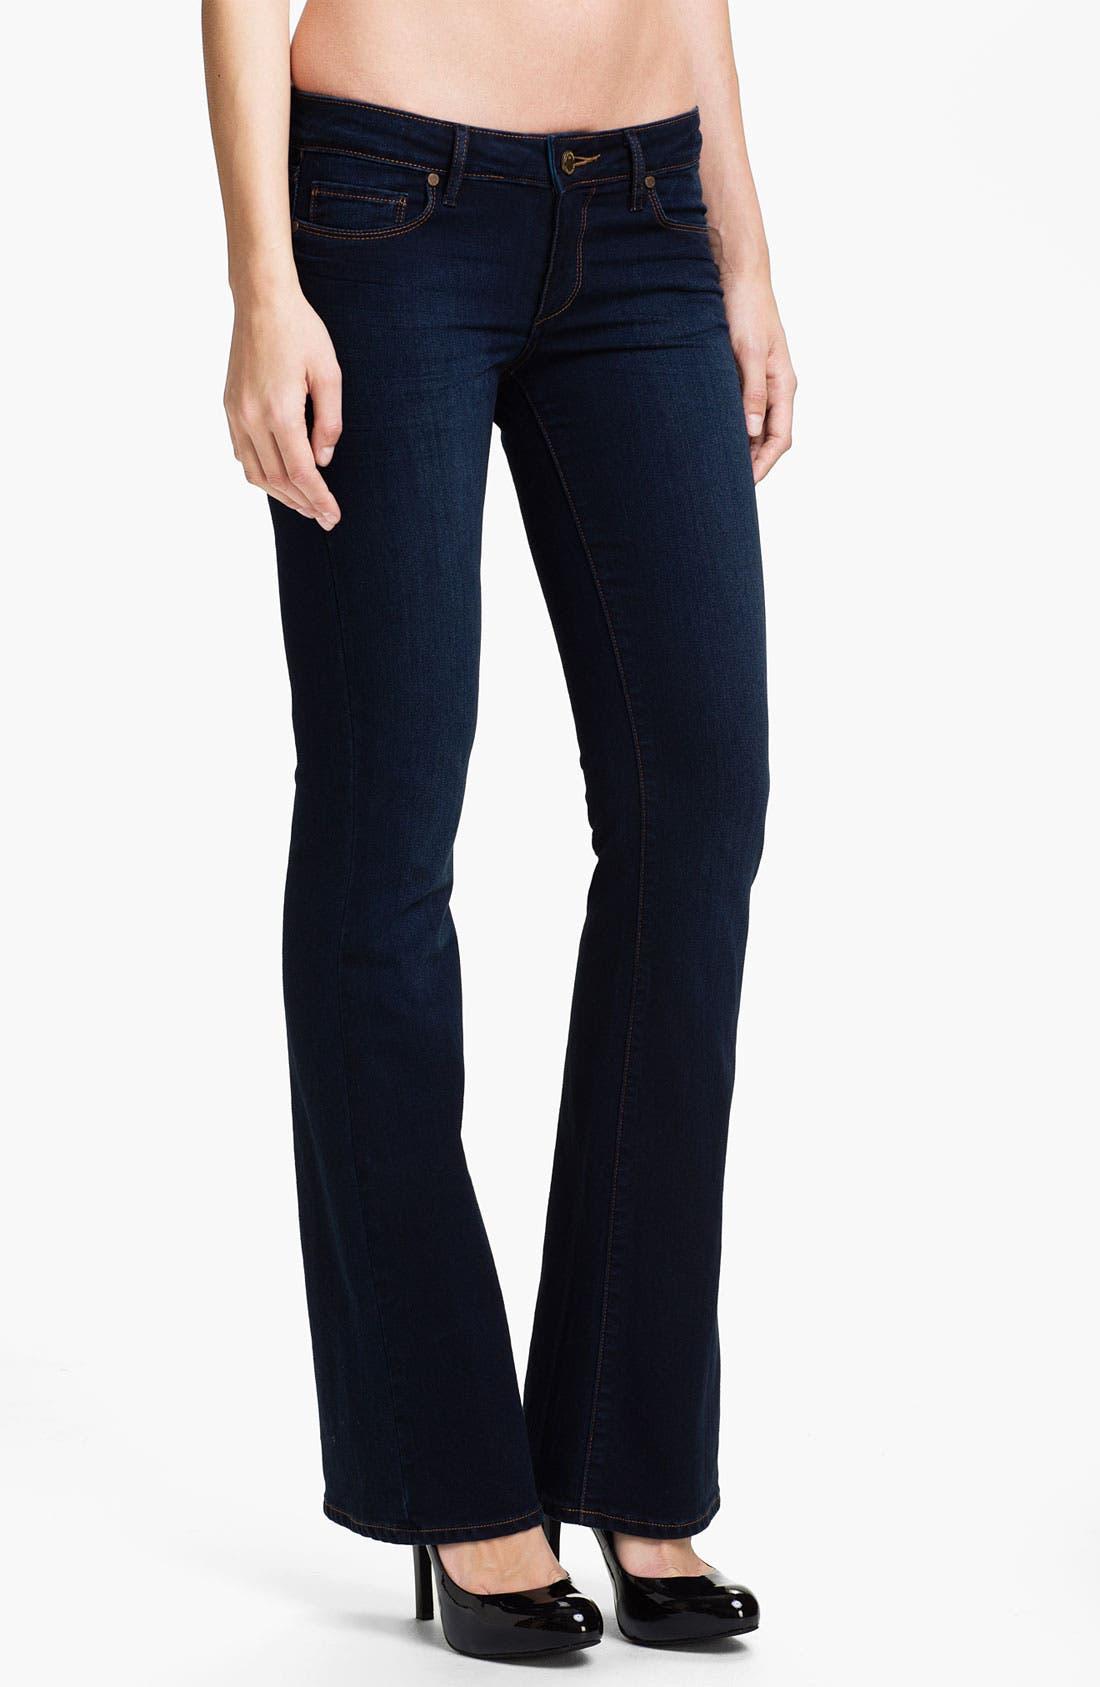 Alternate Image 1 Selected - Paige Denim 'Skyline' Bootcut Jeans (Lynx)